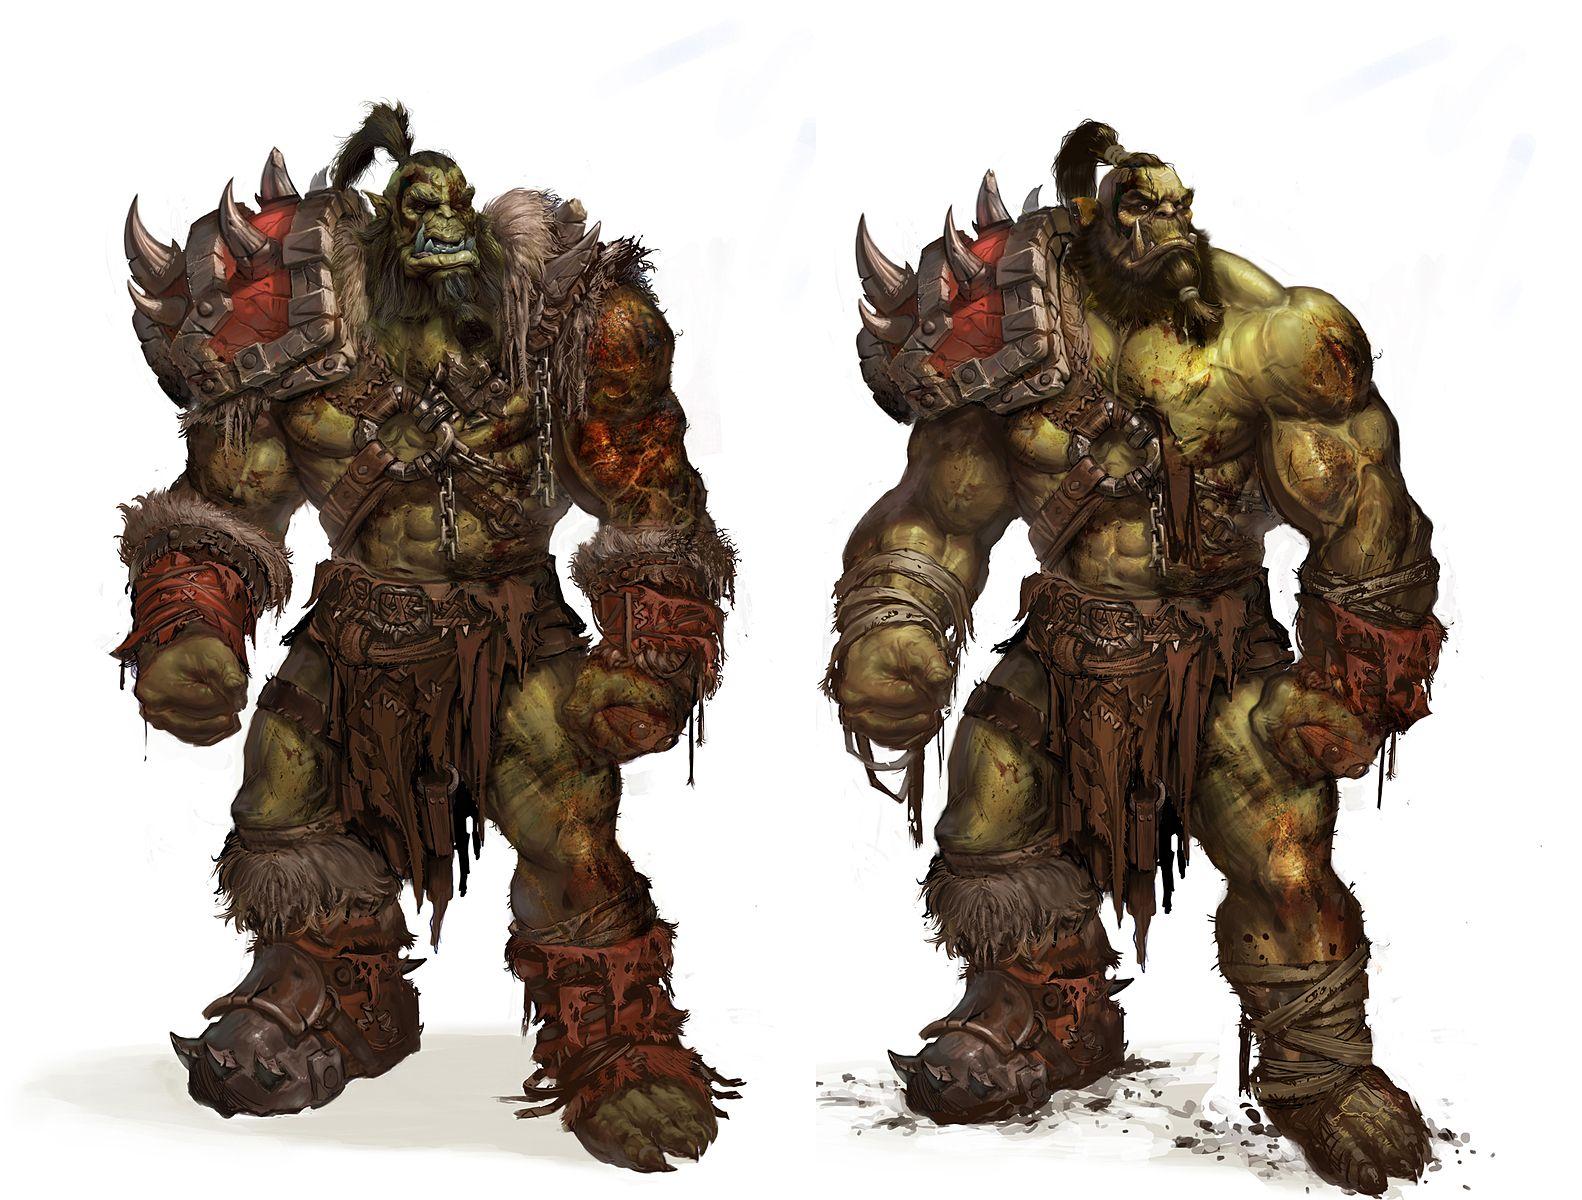 warcraft orc horde - photo #31